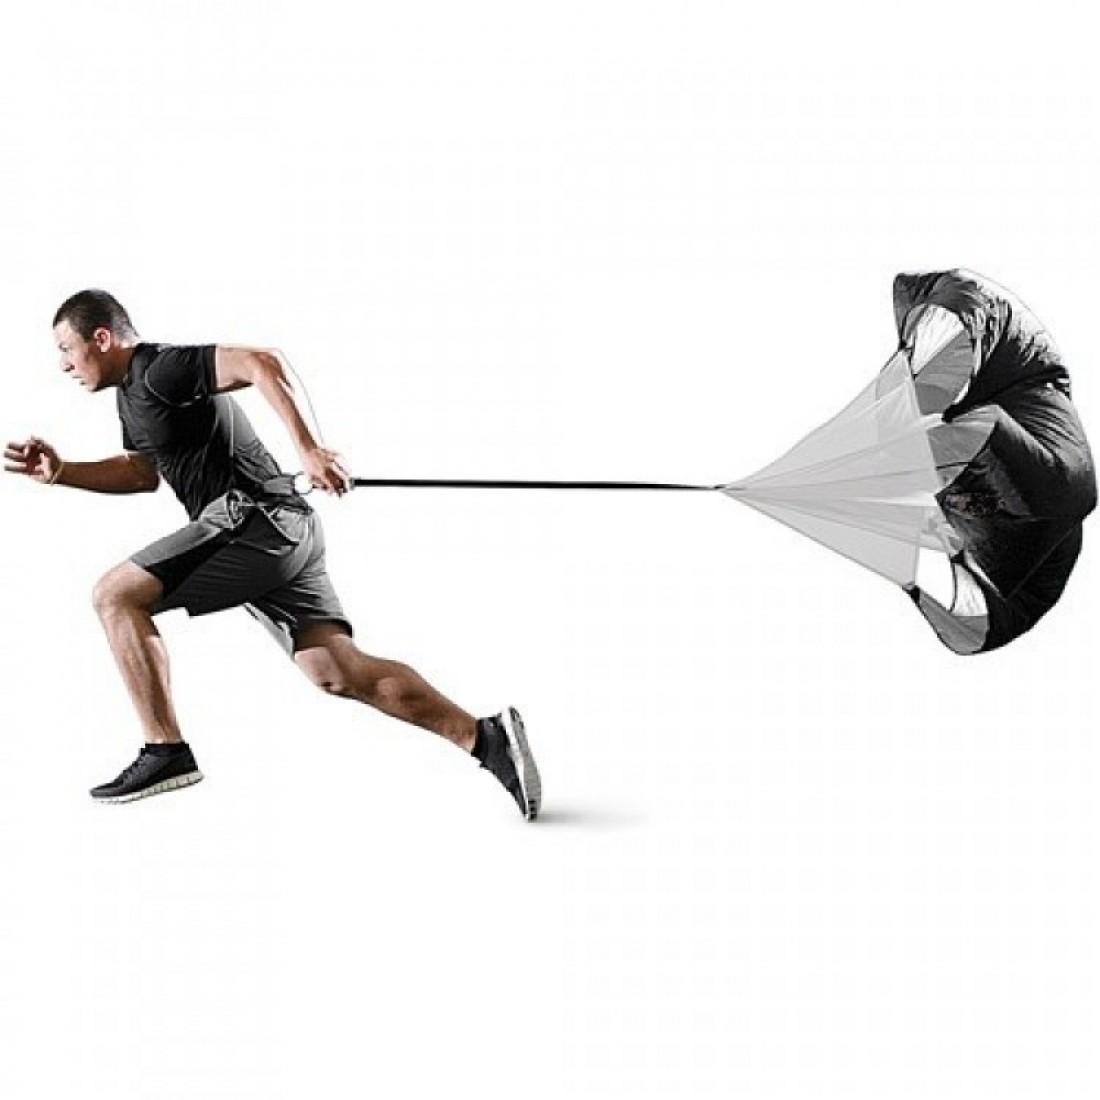 TRX / Функциональный тренинг / Кроссфит: Парашют для бега LiveUp SPEED CHUTE